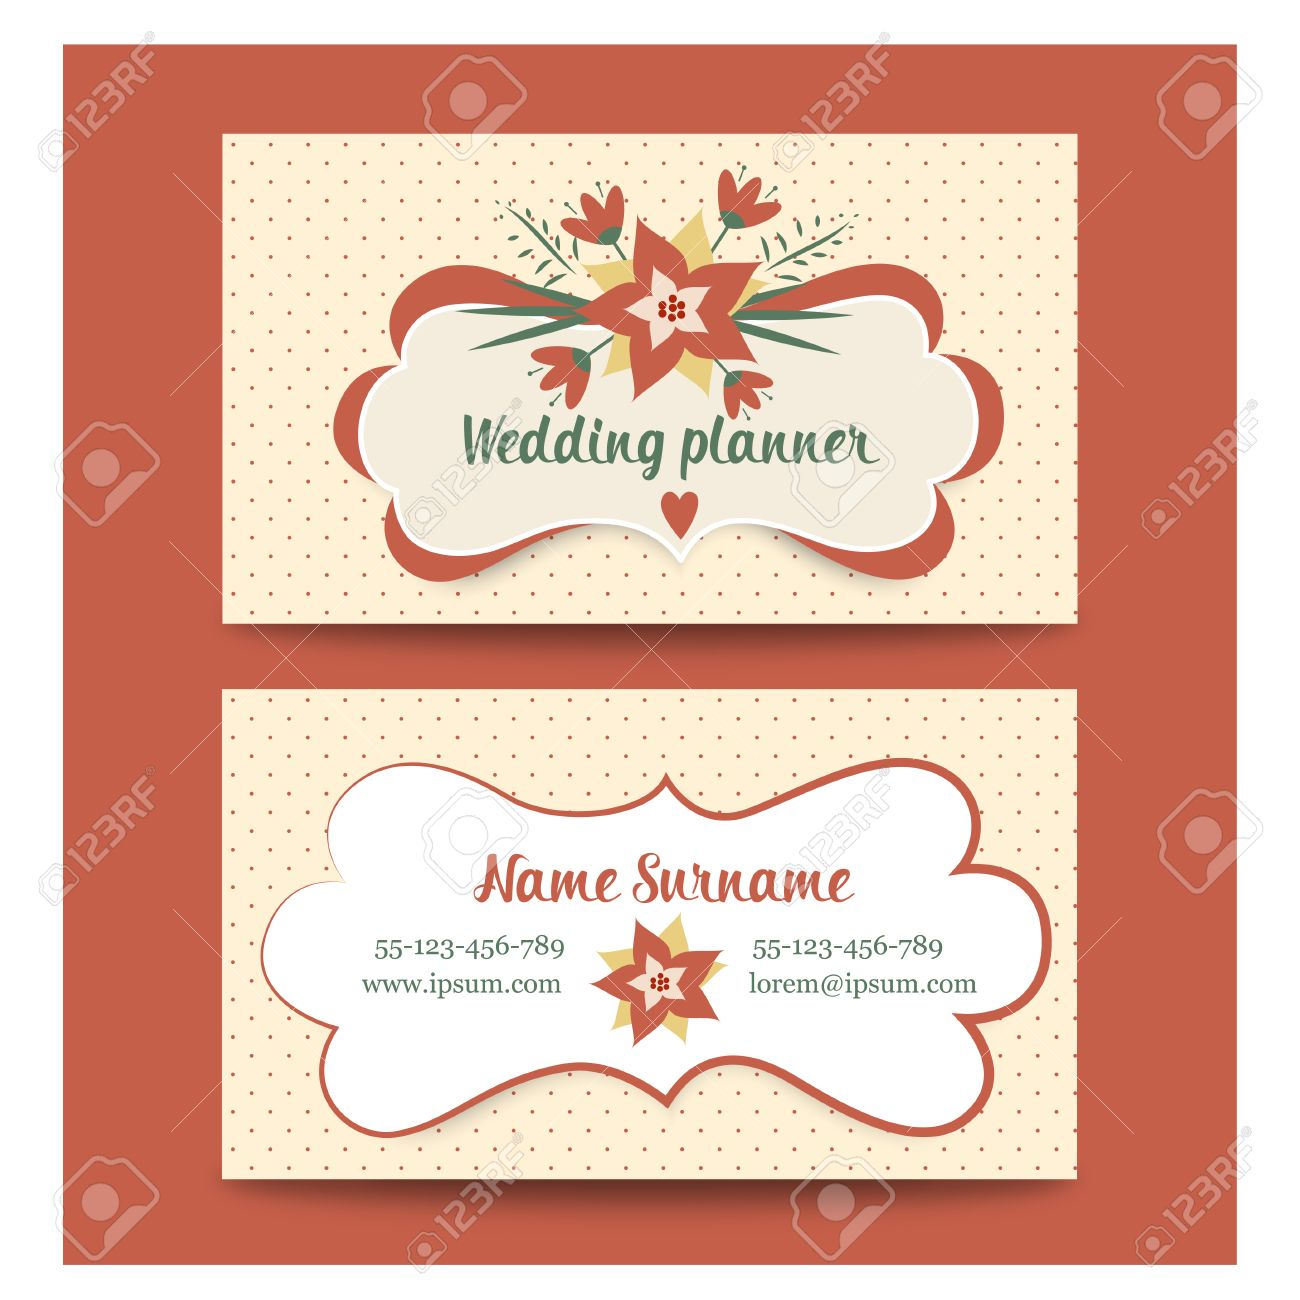 Template Business Cards For Wedding Planner Or Florist. Vintage ...